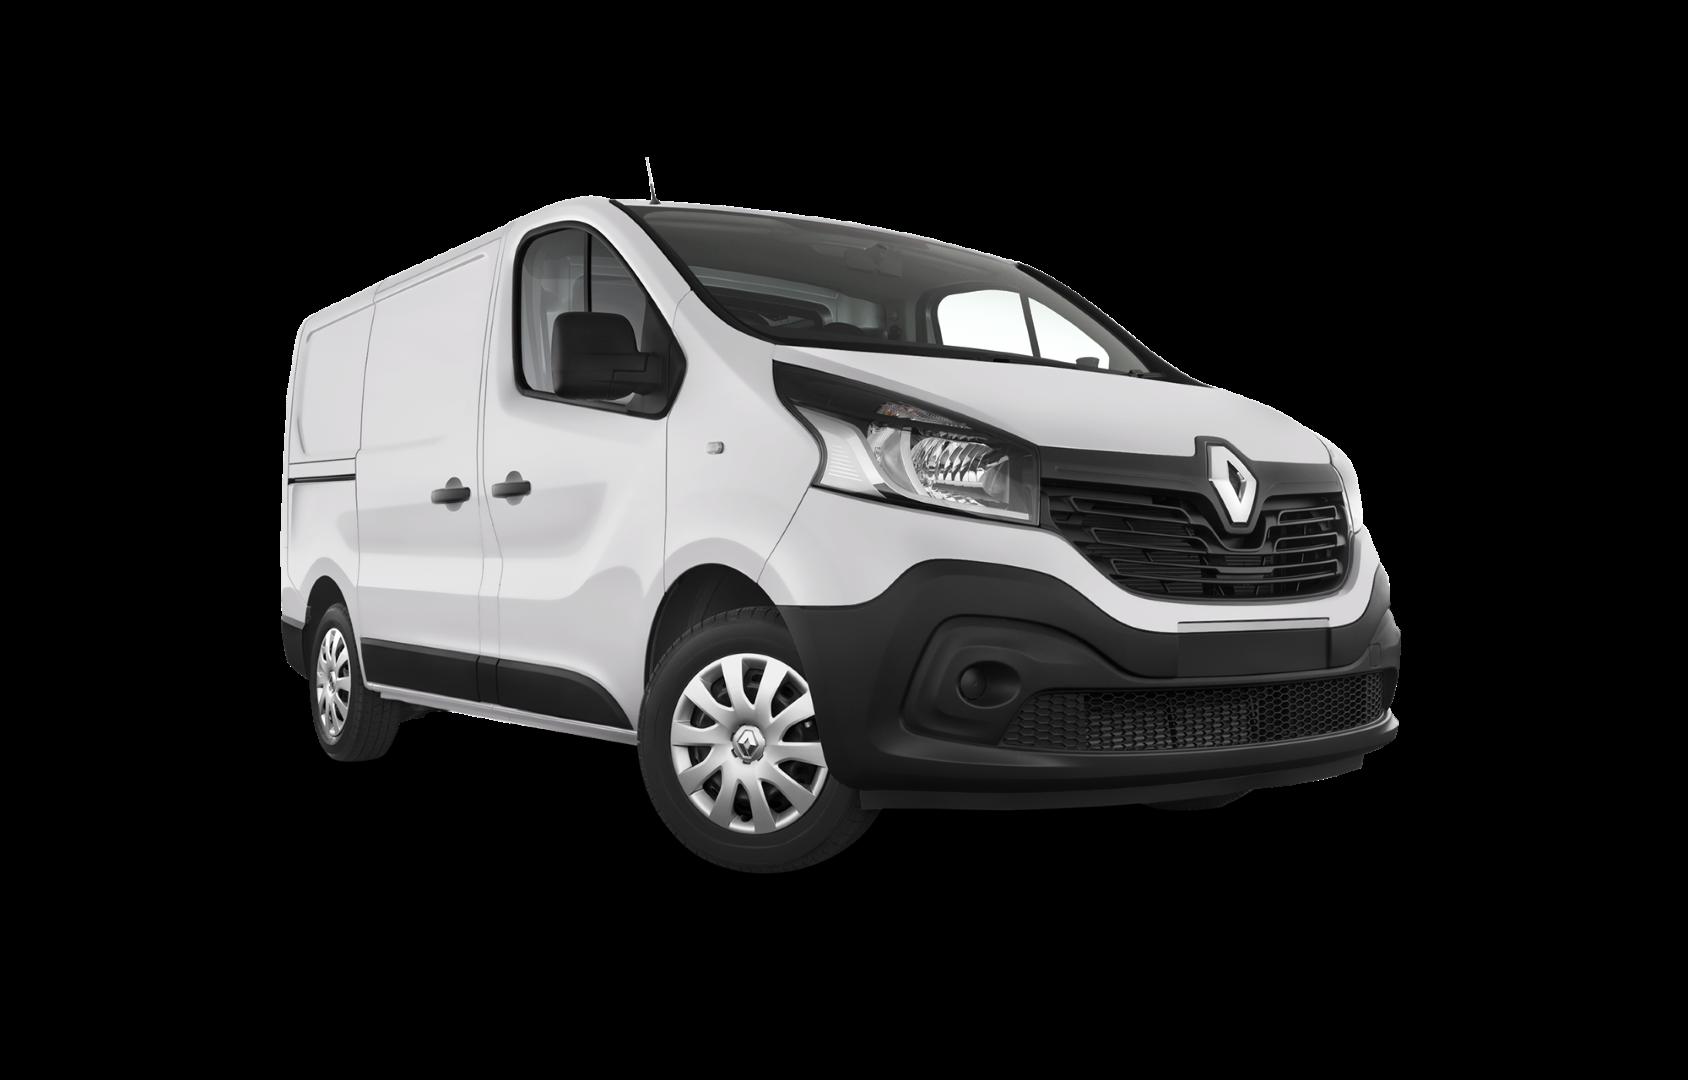 Renault Trafic Furgon